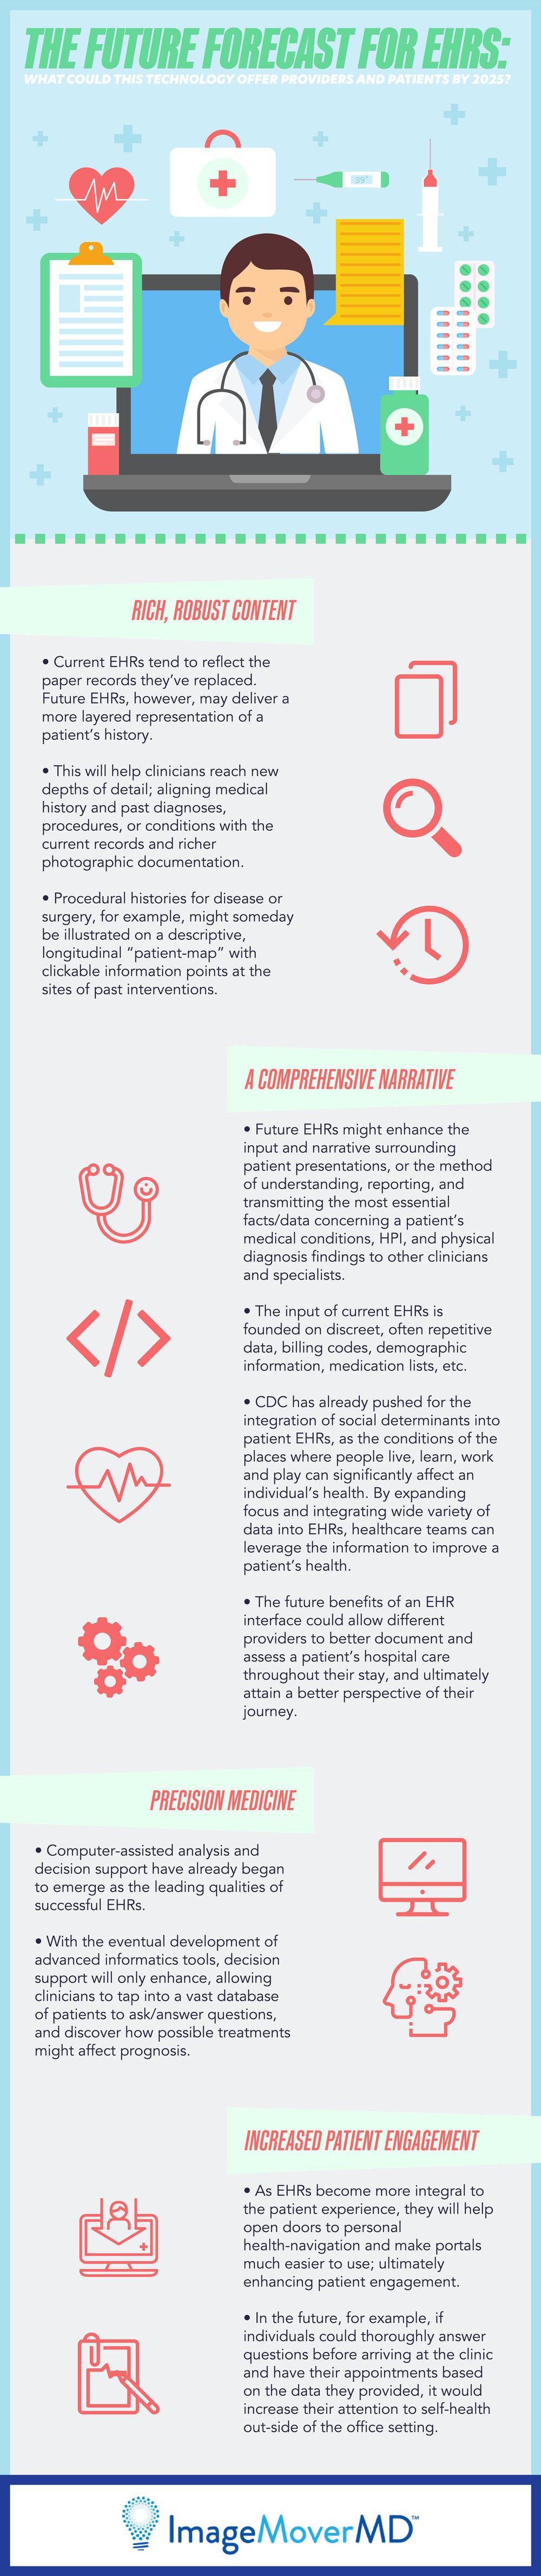 ImageMover_FutureForecastForEHRs-01-infographic.jpg